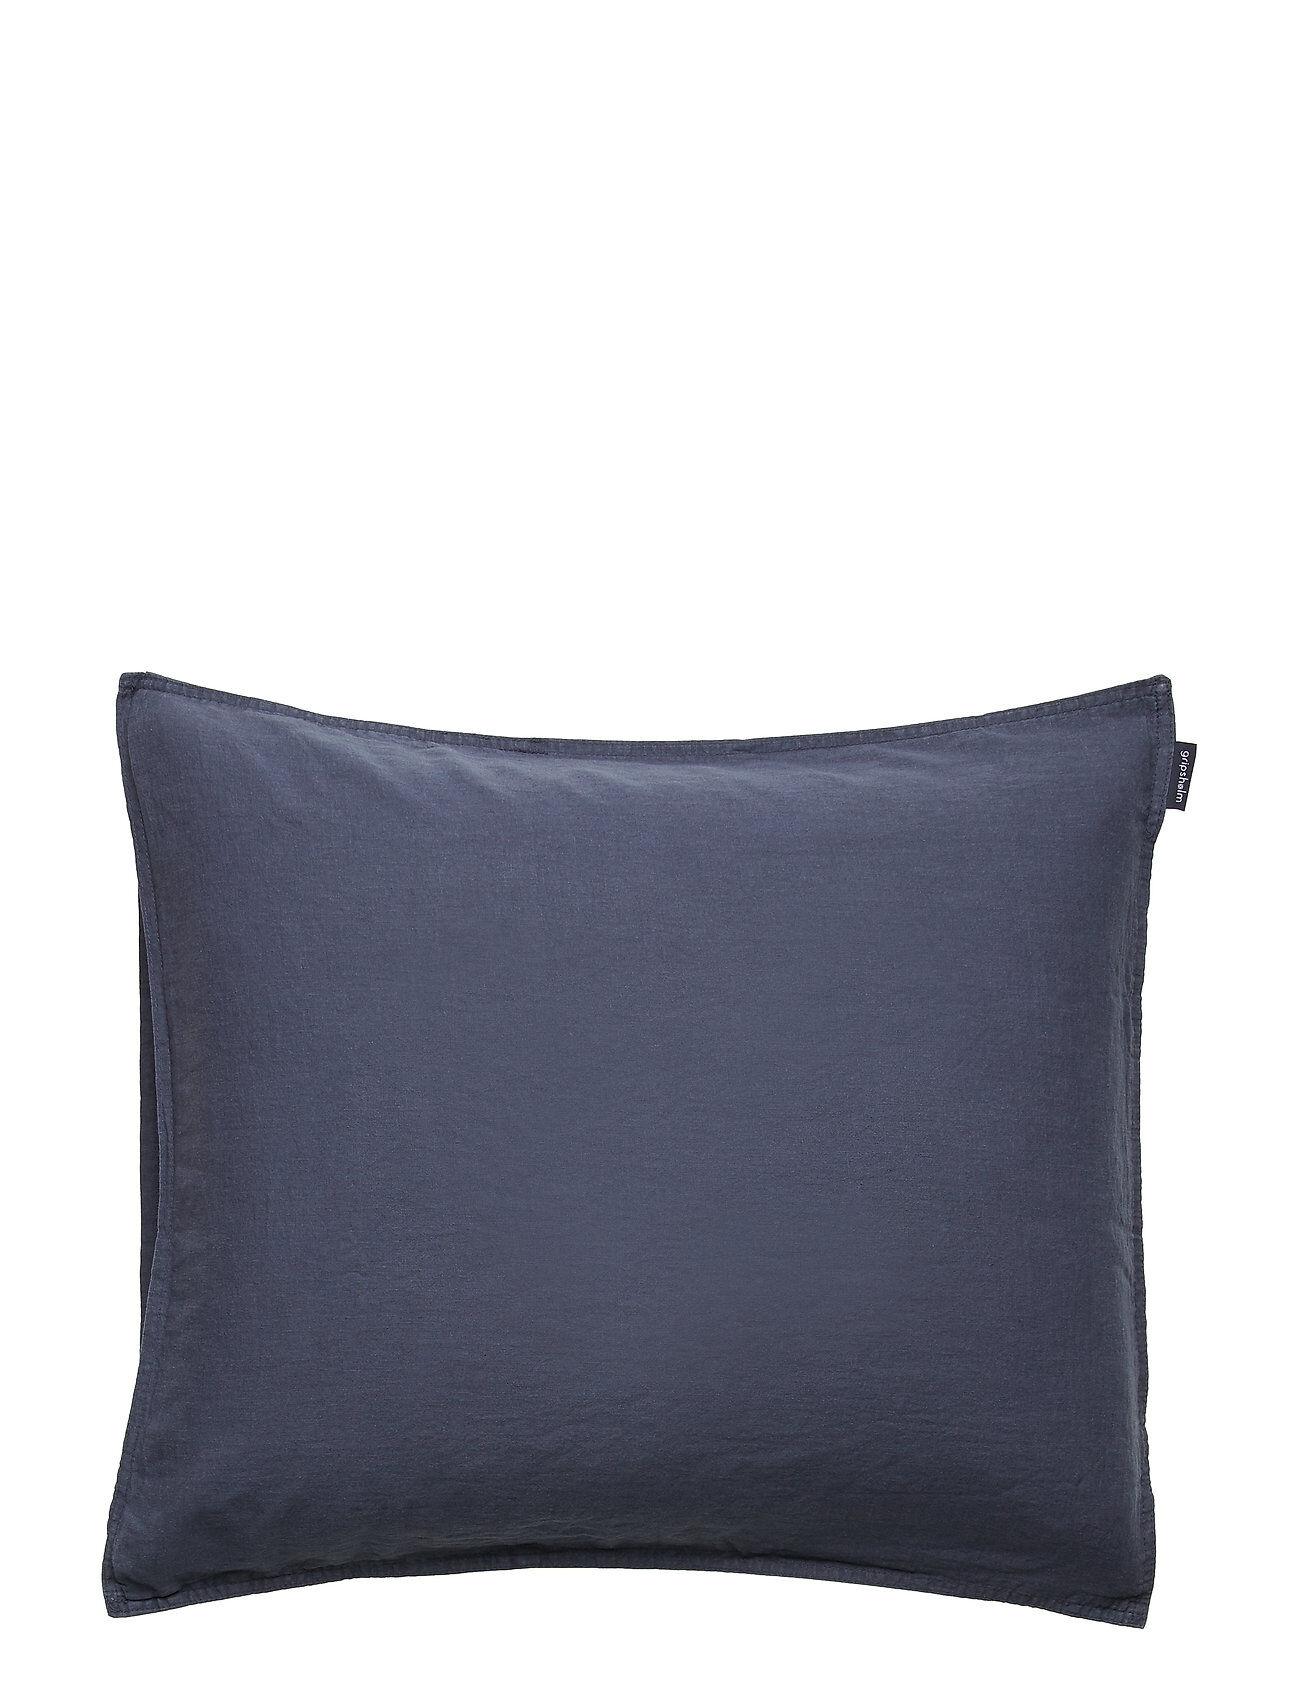 Gripsholm Pillowcase Linen Blend Home Bedroom Bedding Pillowcases Sininen Gripsholm